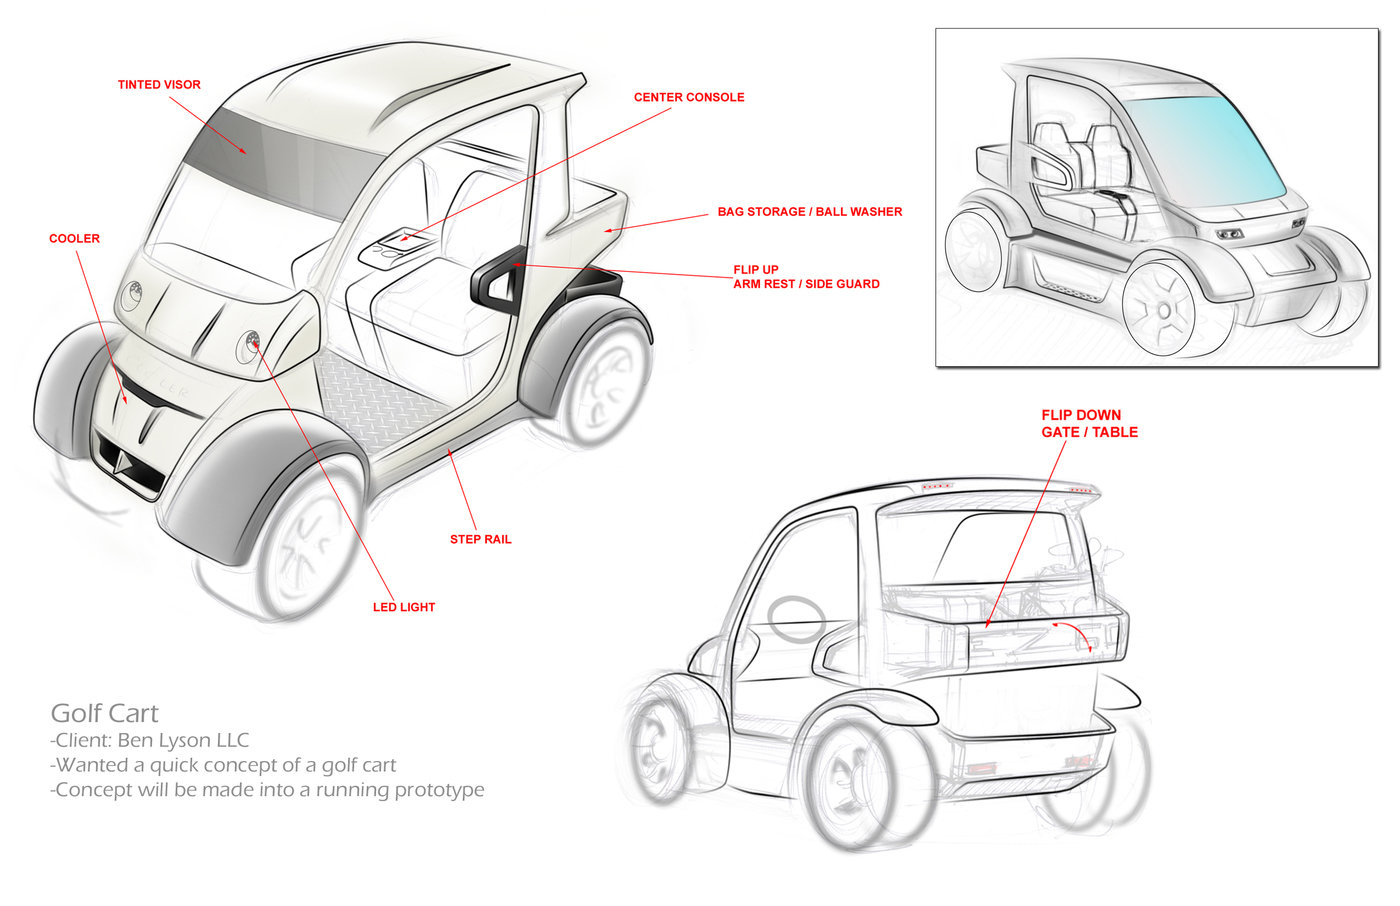 Lyson Llc Golf Cart By Phil Hall Mba At Coroflot